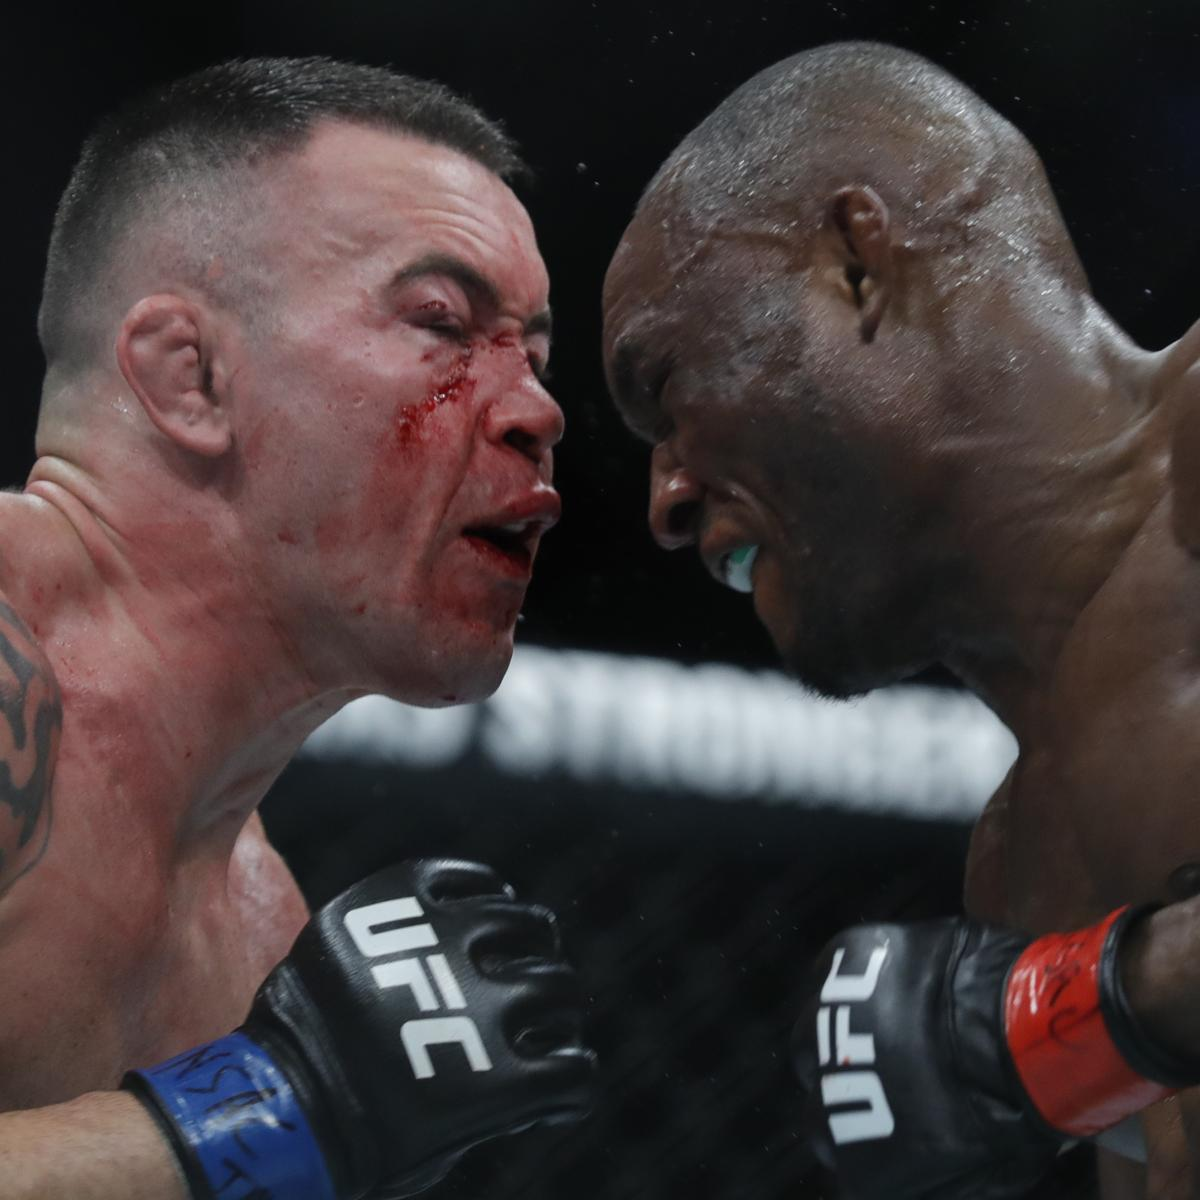 TGIFighting: Colby Covington Has No Chance vs. Kamaru Usman at UFC 268